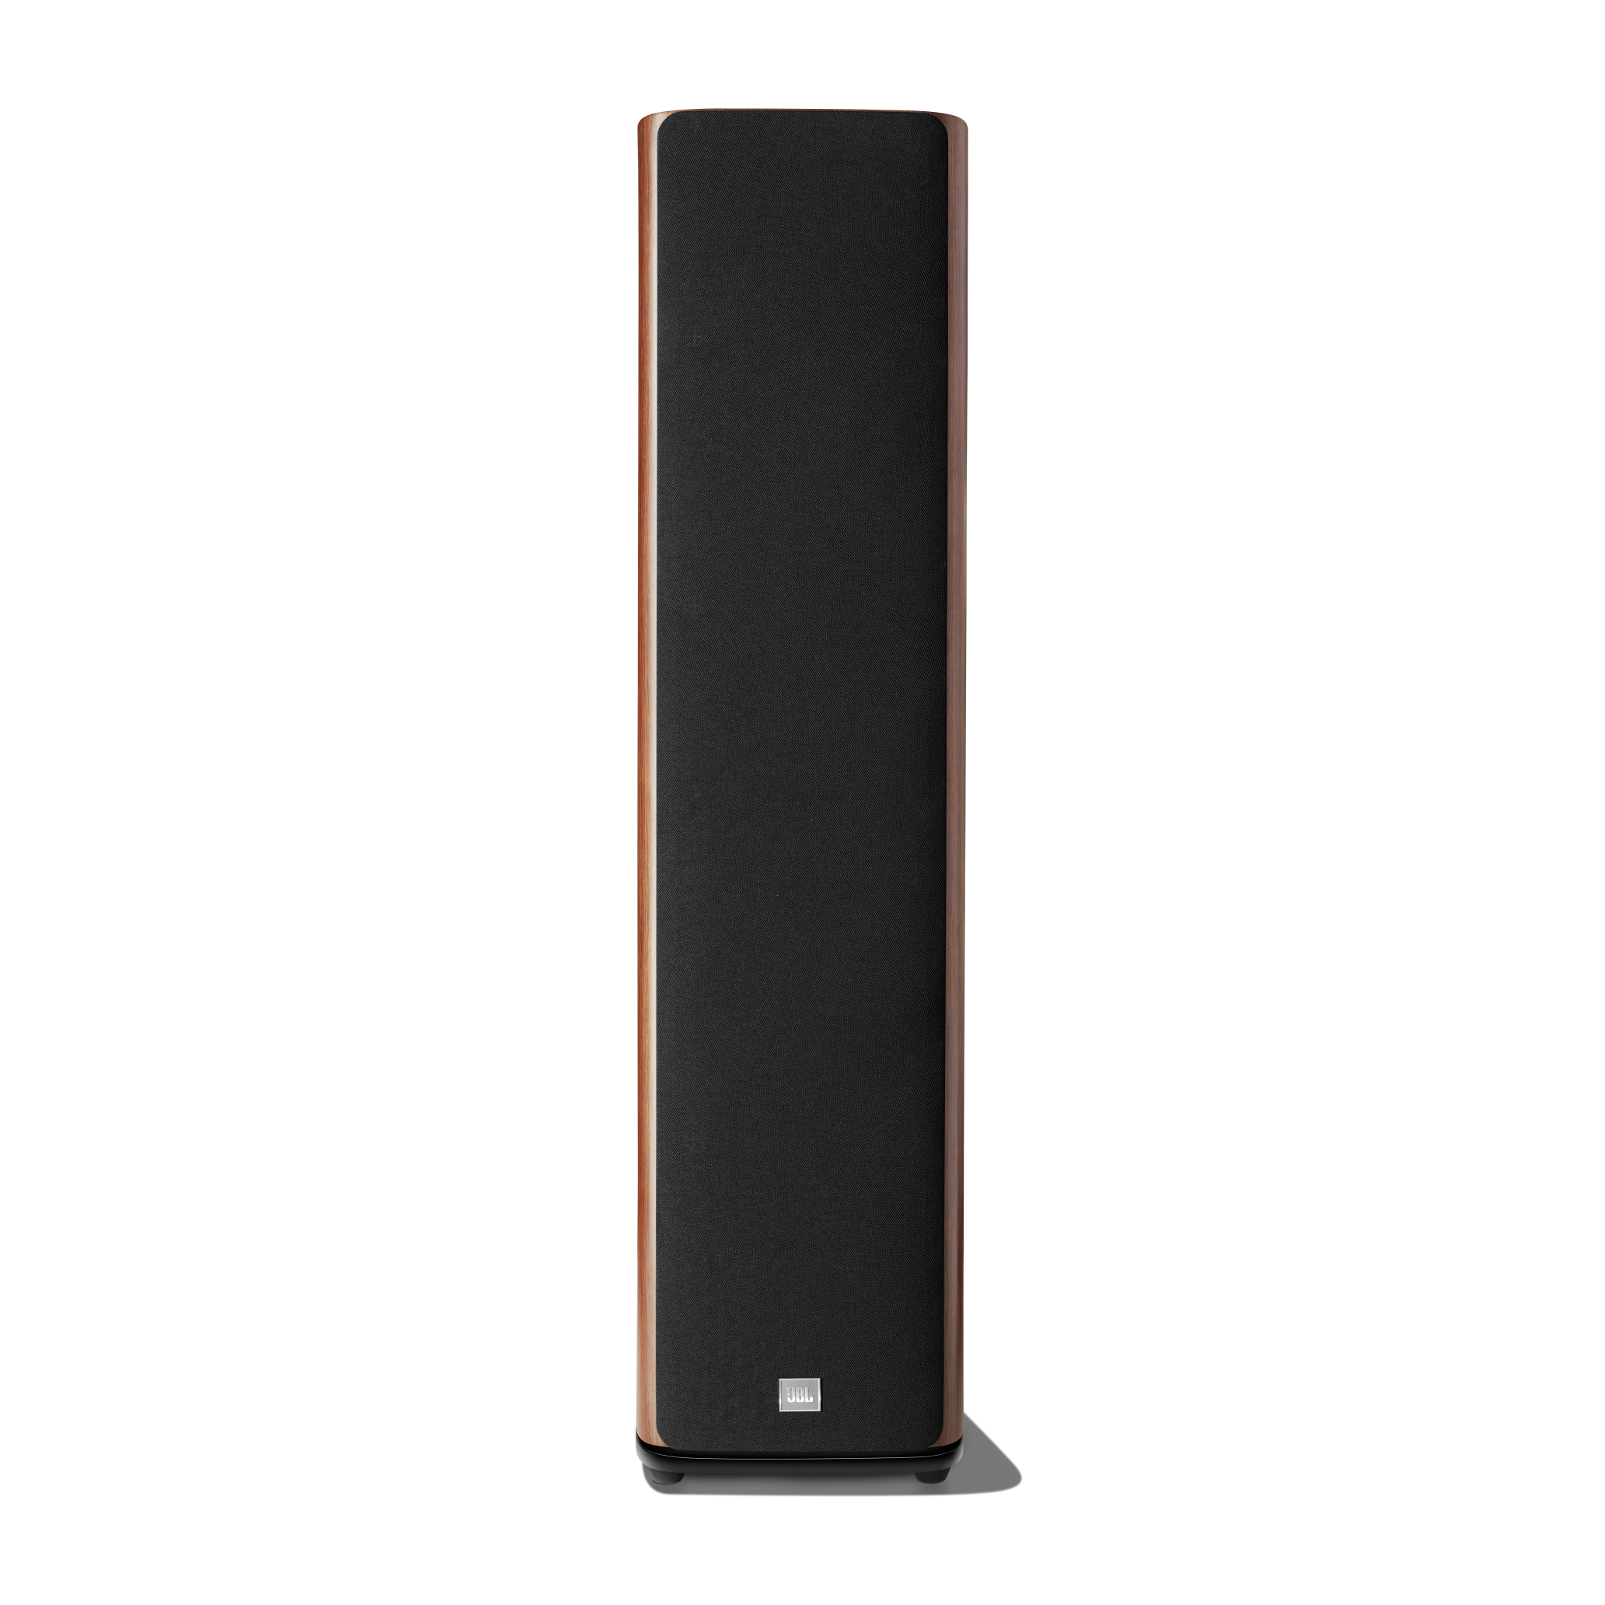 HDI-3600 - Walnut - 2 ½-way Triple 6.5-inch (165mm) Floorstanding Loudspeaker - Front